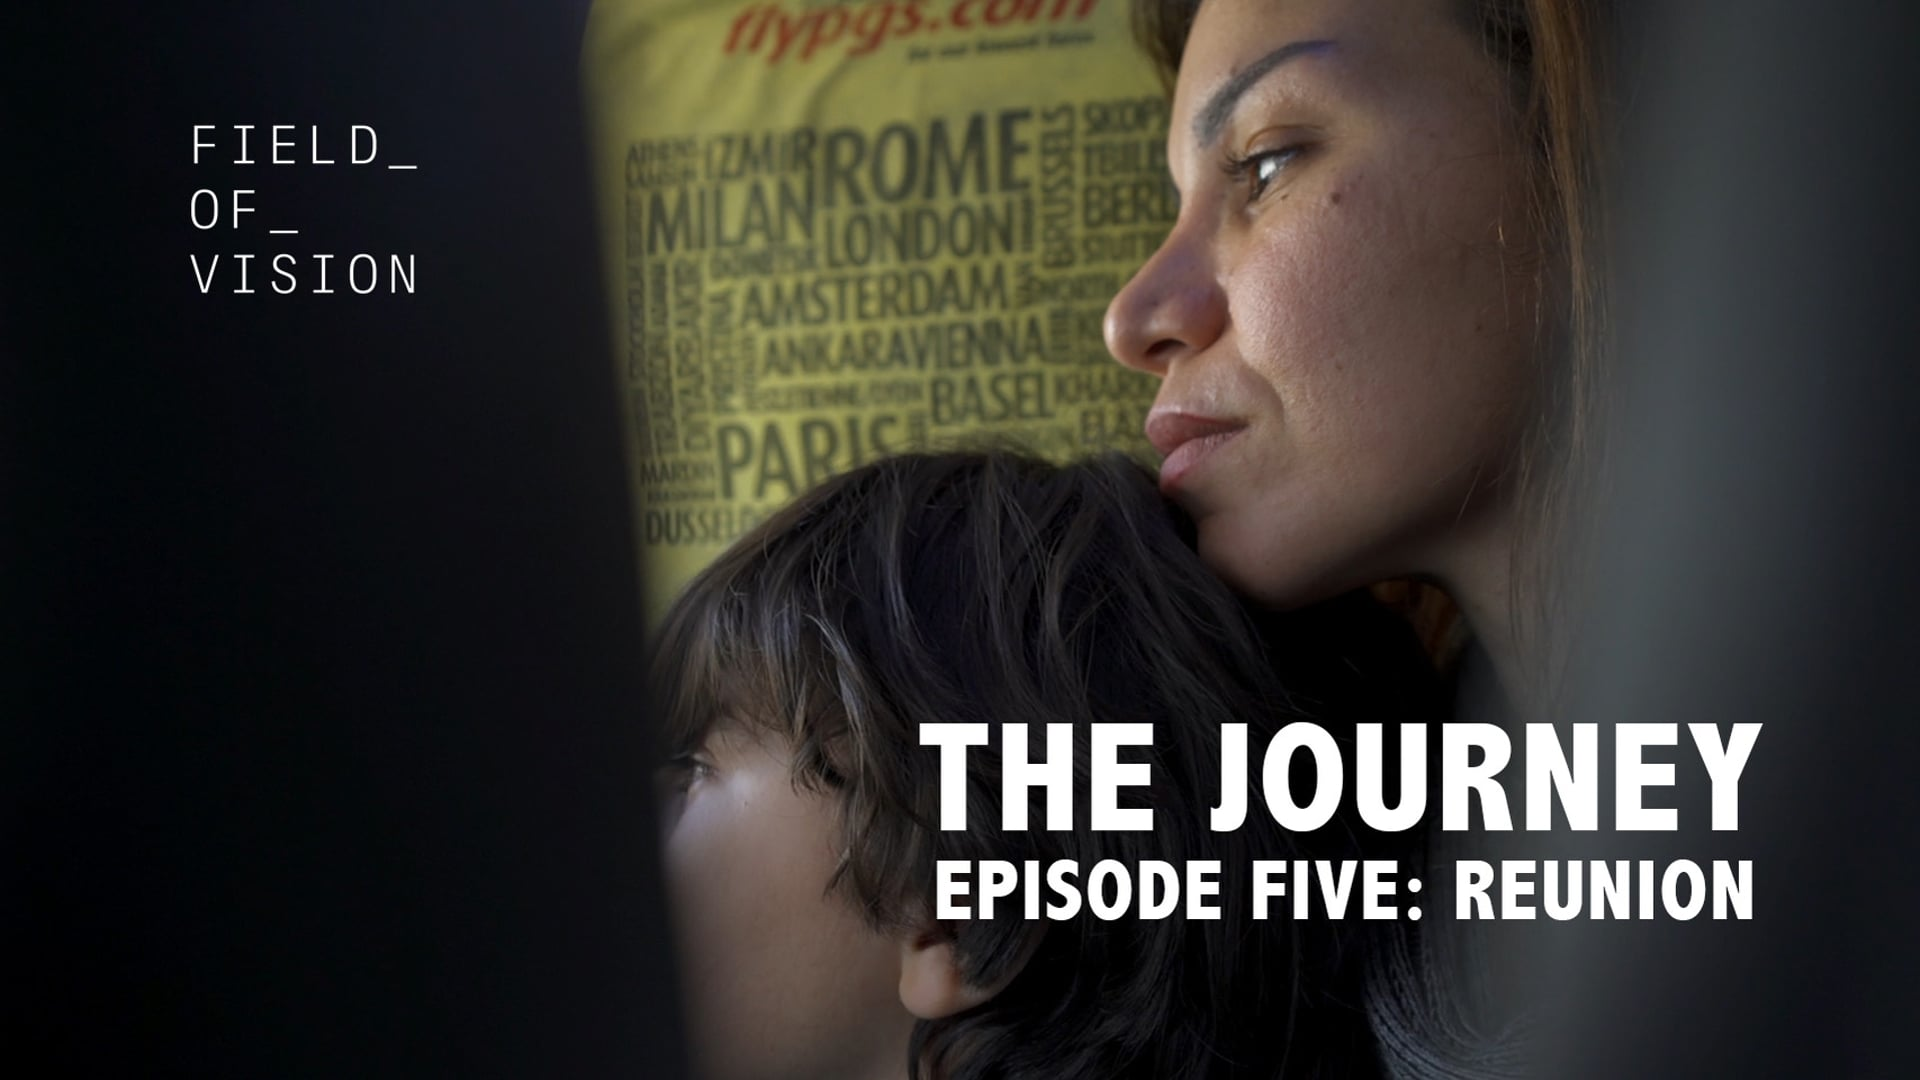 Episode Five: Reunion